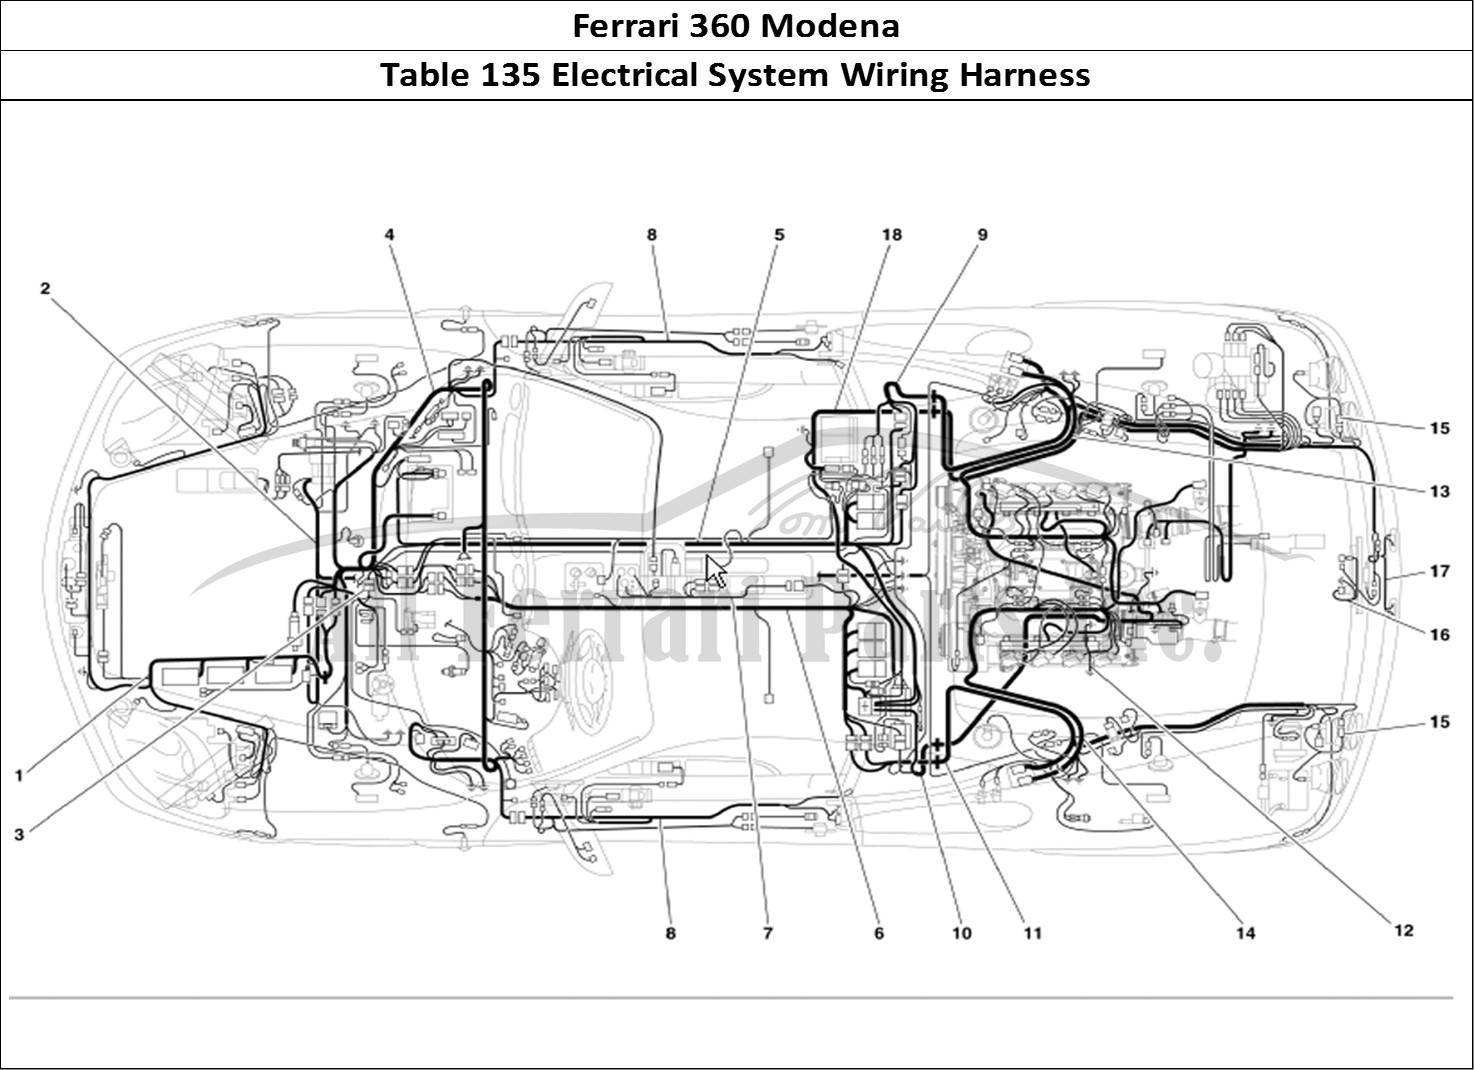 Buy Original Ferrari 360 Modena 135 Electrical System Wiring Harness Ferrari Parts Spares